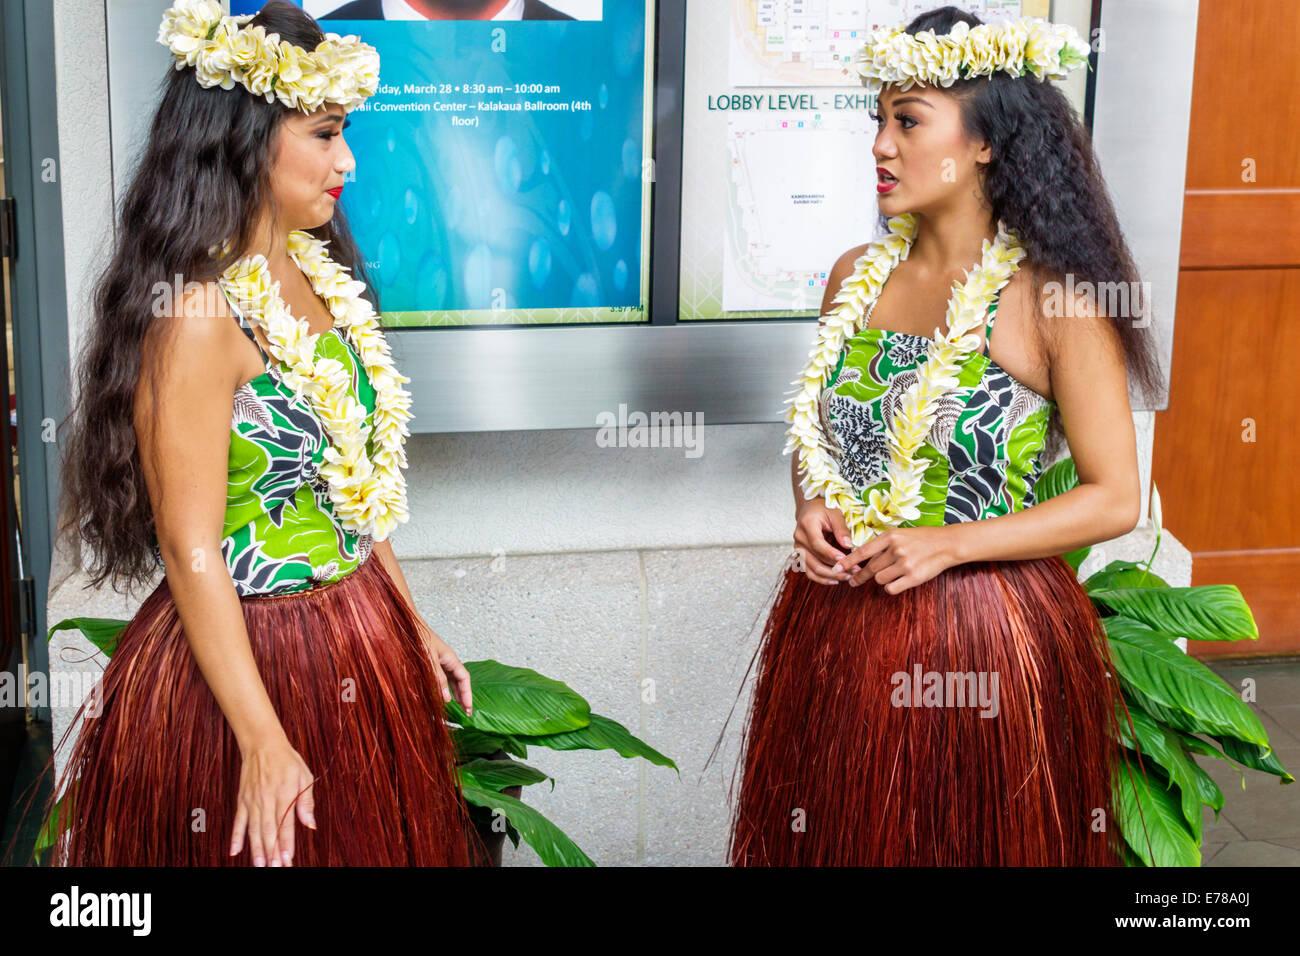 Honolulu Hawaii Hawaiian Oahu Convention Center centre inside interior hula dancers greeter grass skirt flower lei - Stock Image